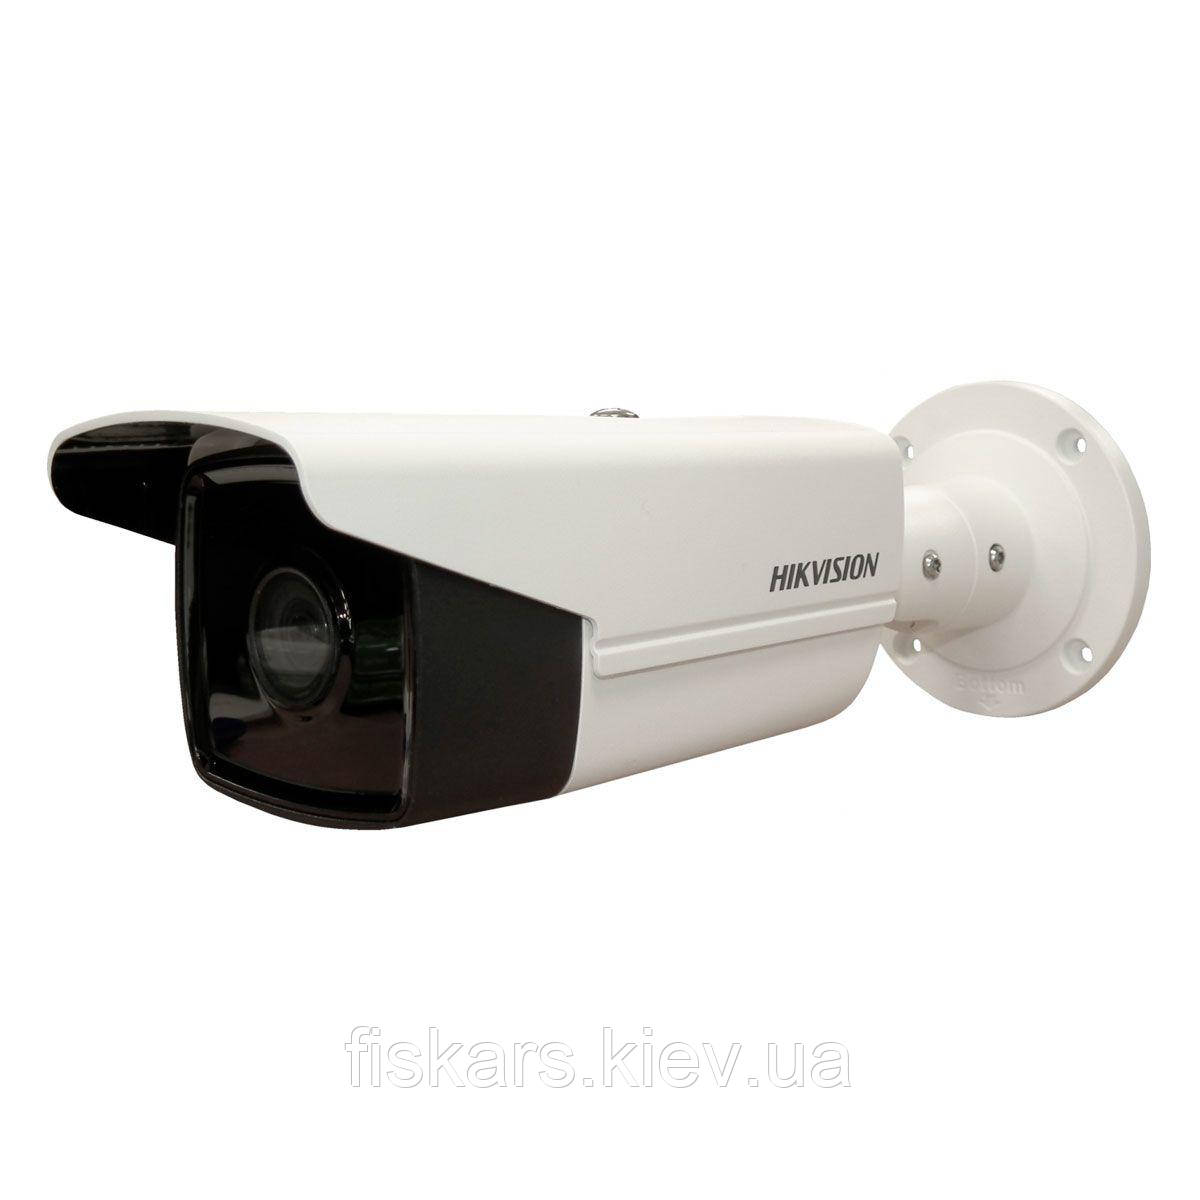 2 Мп IP видеокамера Hikvision DS-2CD2T23G0-I8